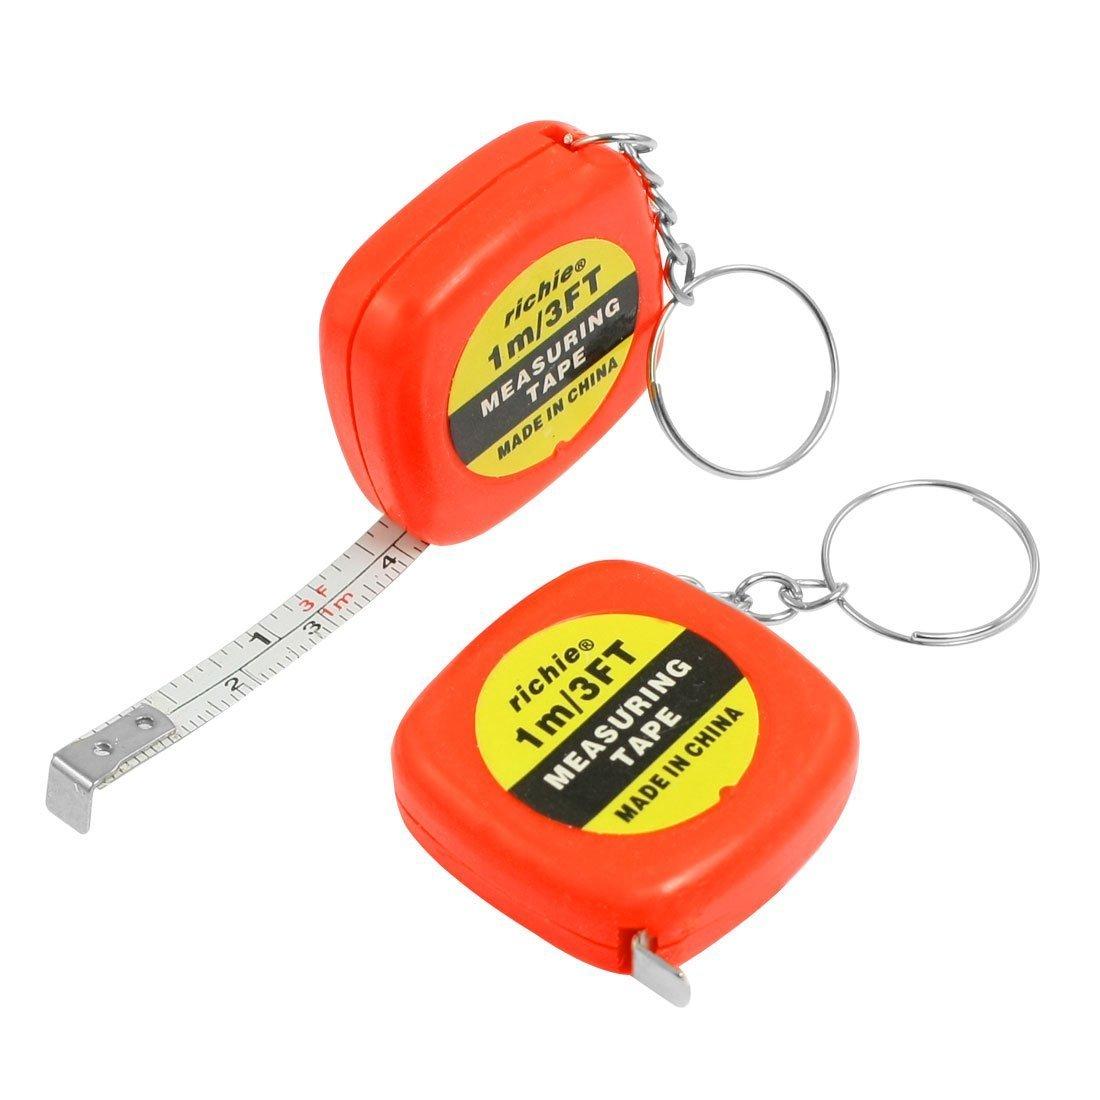 2 piezas multifunció n naranja rojo 1 Meter 91, 44 cm w Mini llavero cinta mé trica 44 cm w Mini llavero cinta métrica Sourcingmap a13011000ux0042